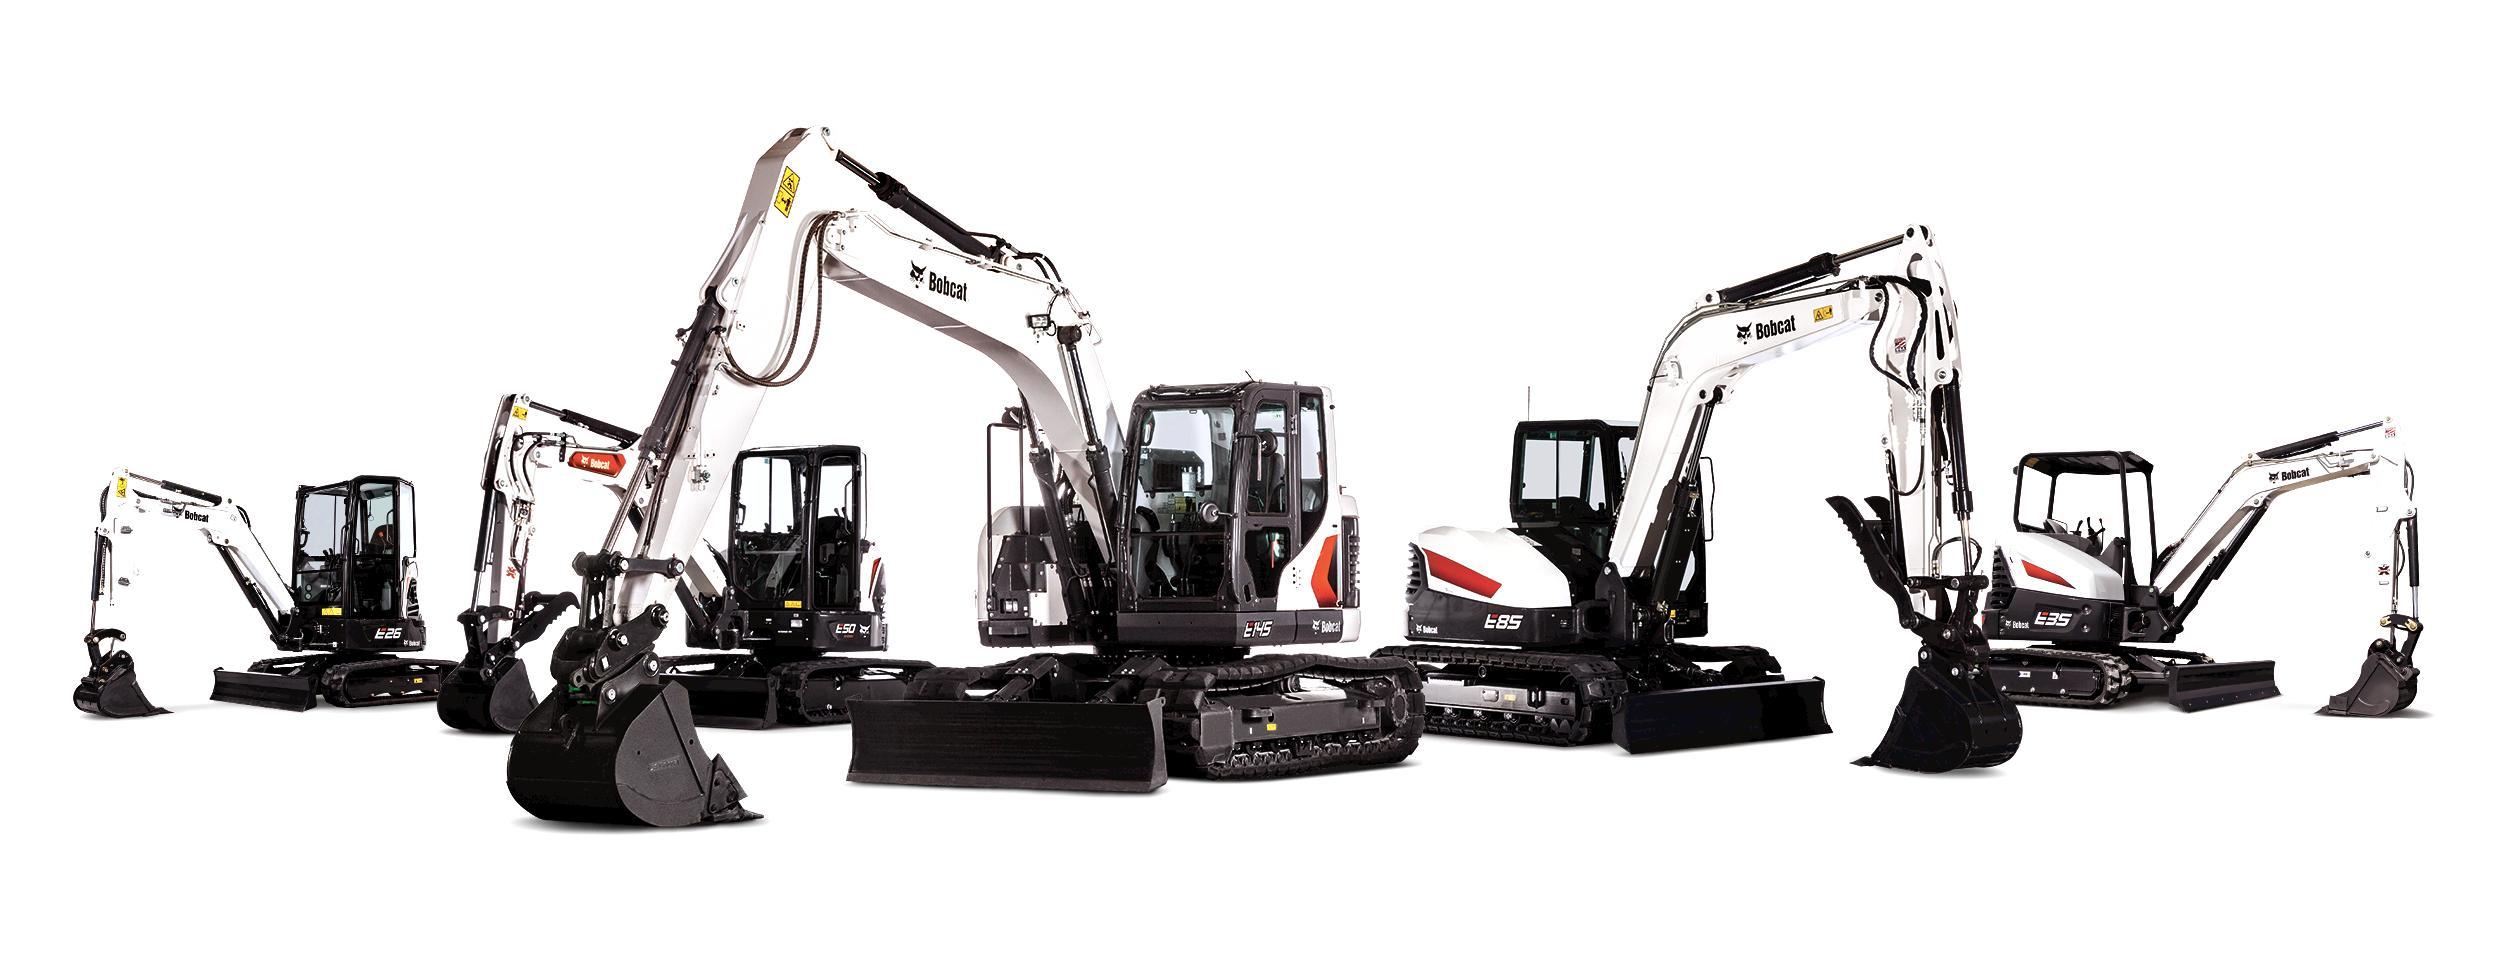 Compact Mini Large Excavators Bobcat Company